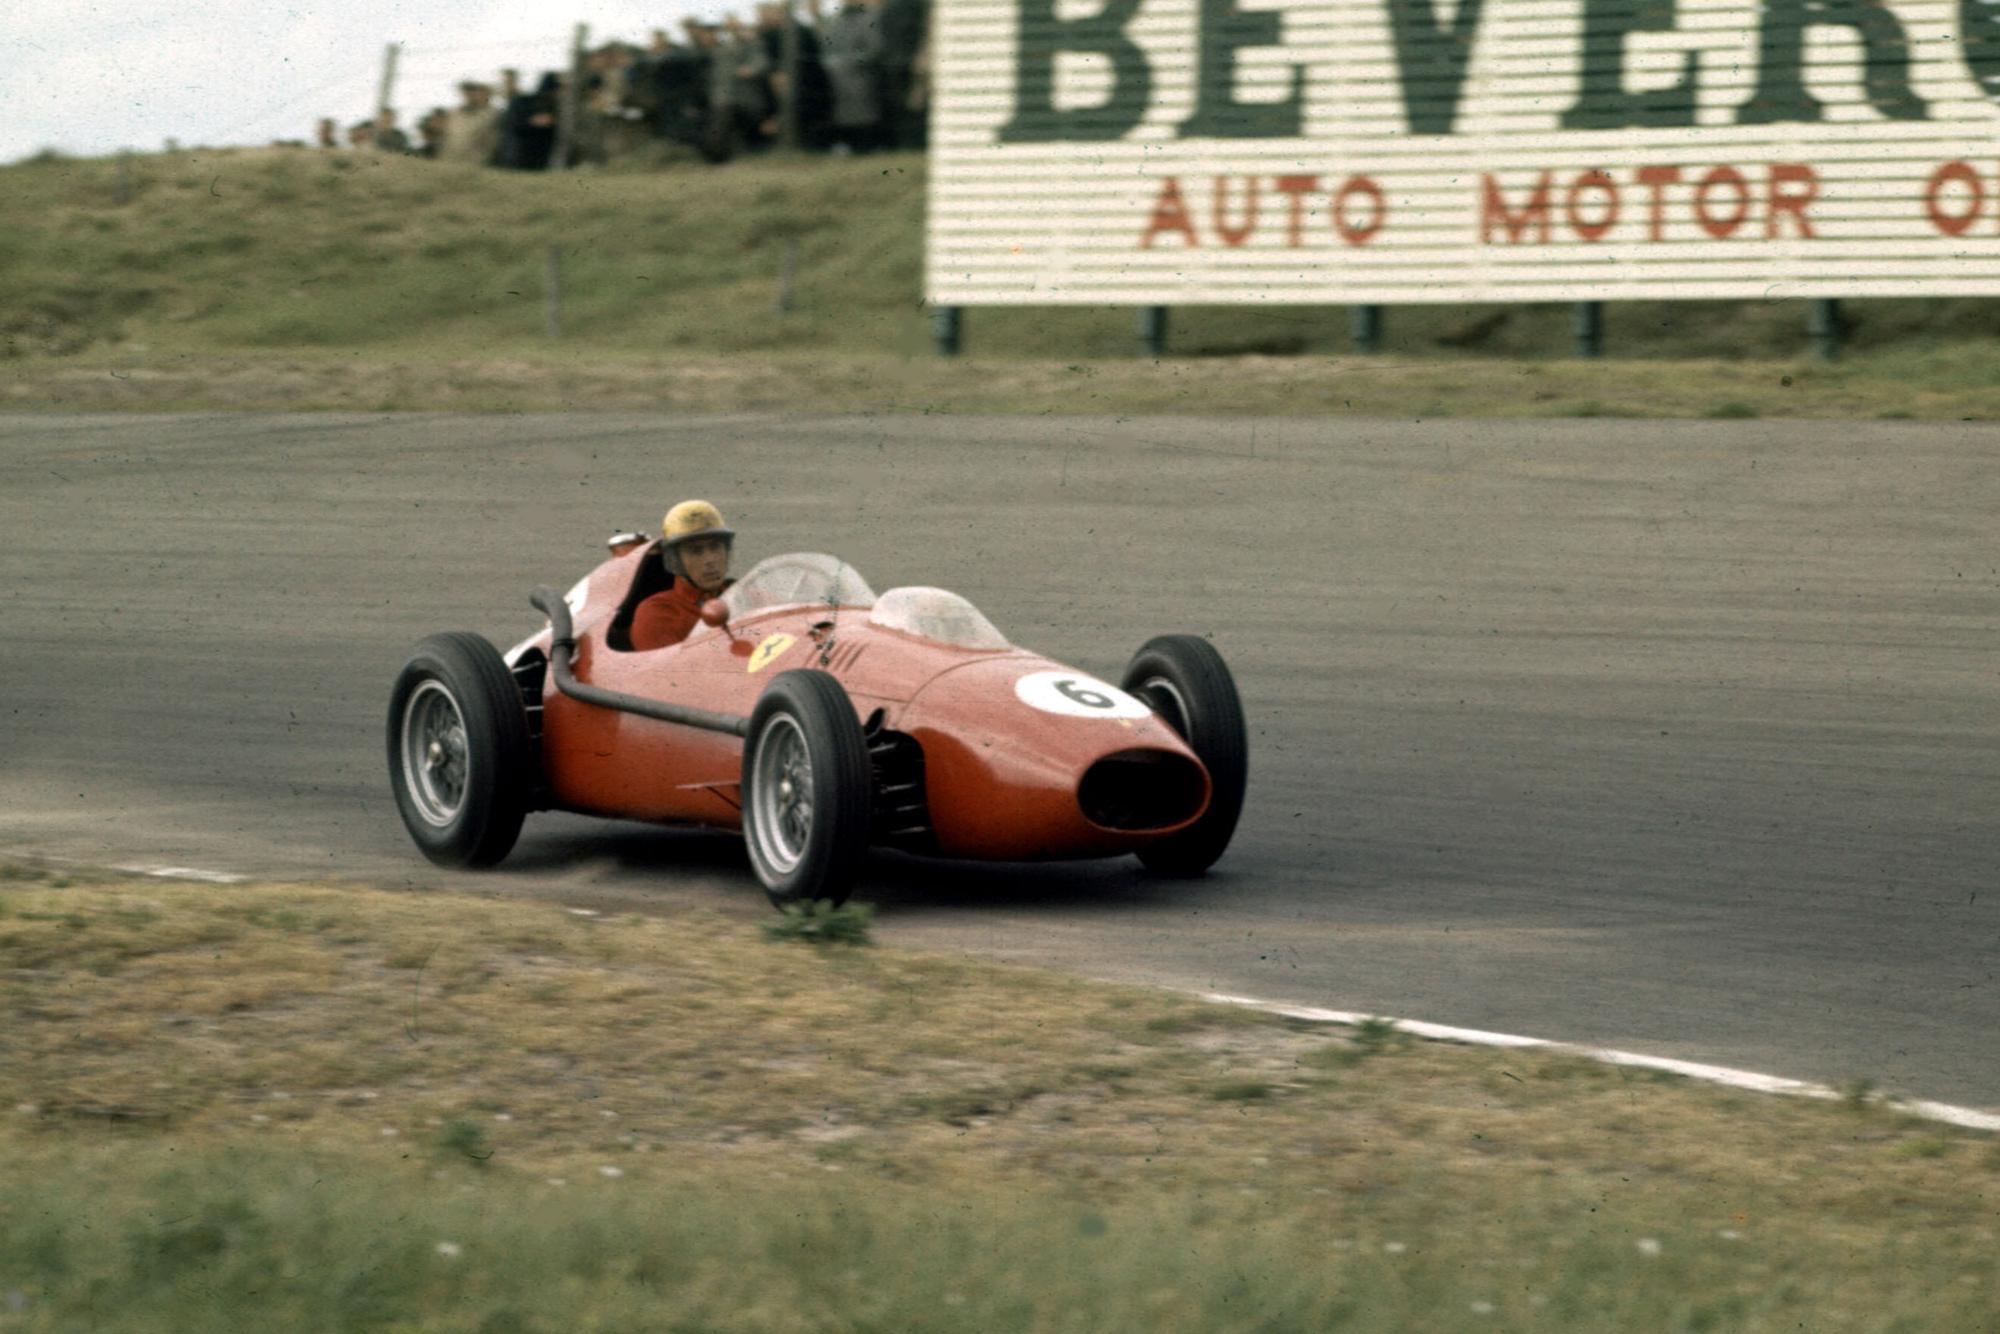 Luigi Musso in a Ferrari Dino 246 who finished in 7th